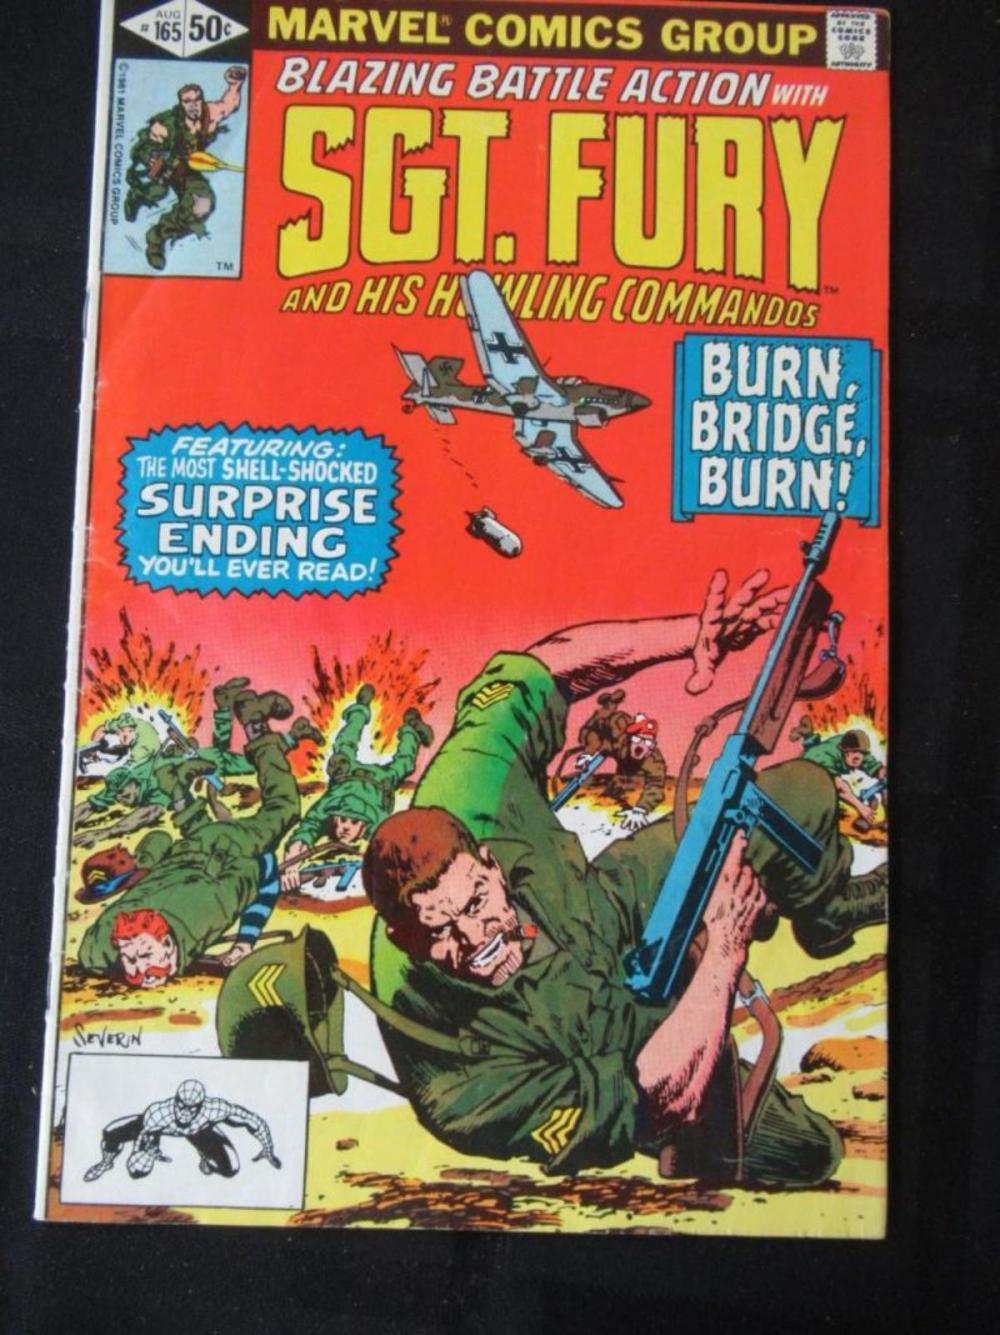 Sgt. Fury #165 Burn Bridge Burn